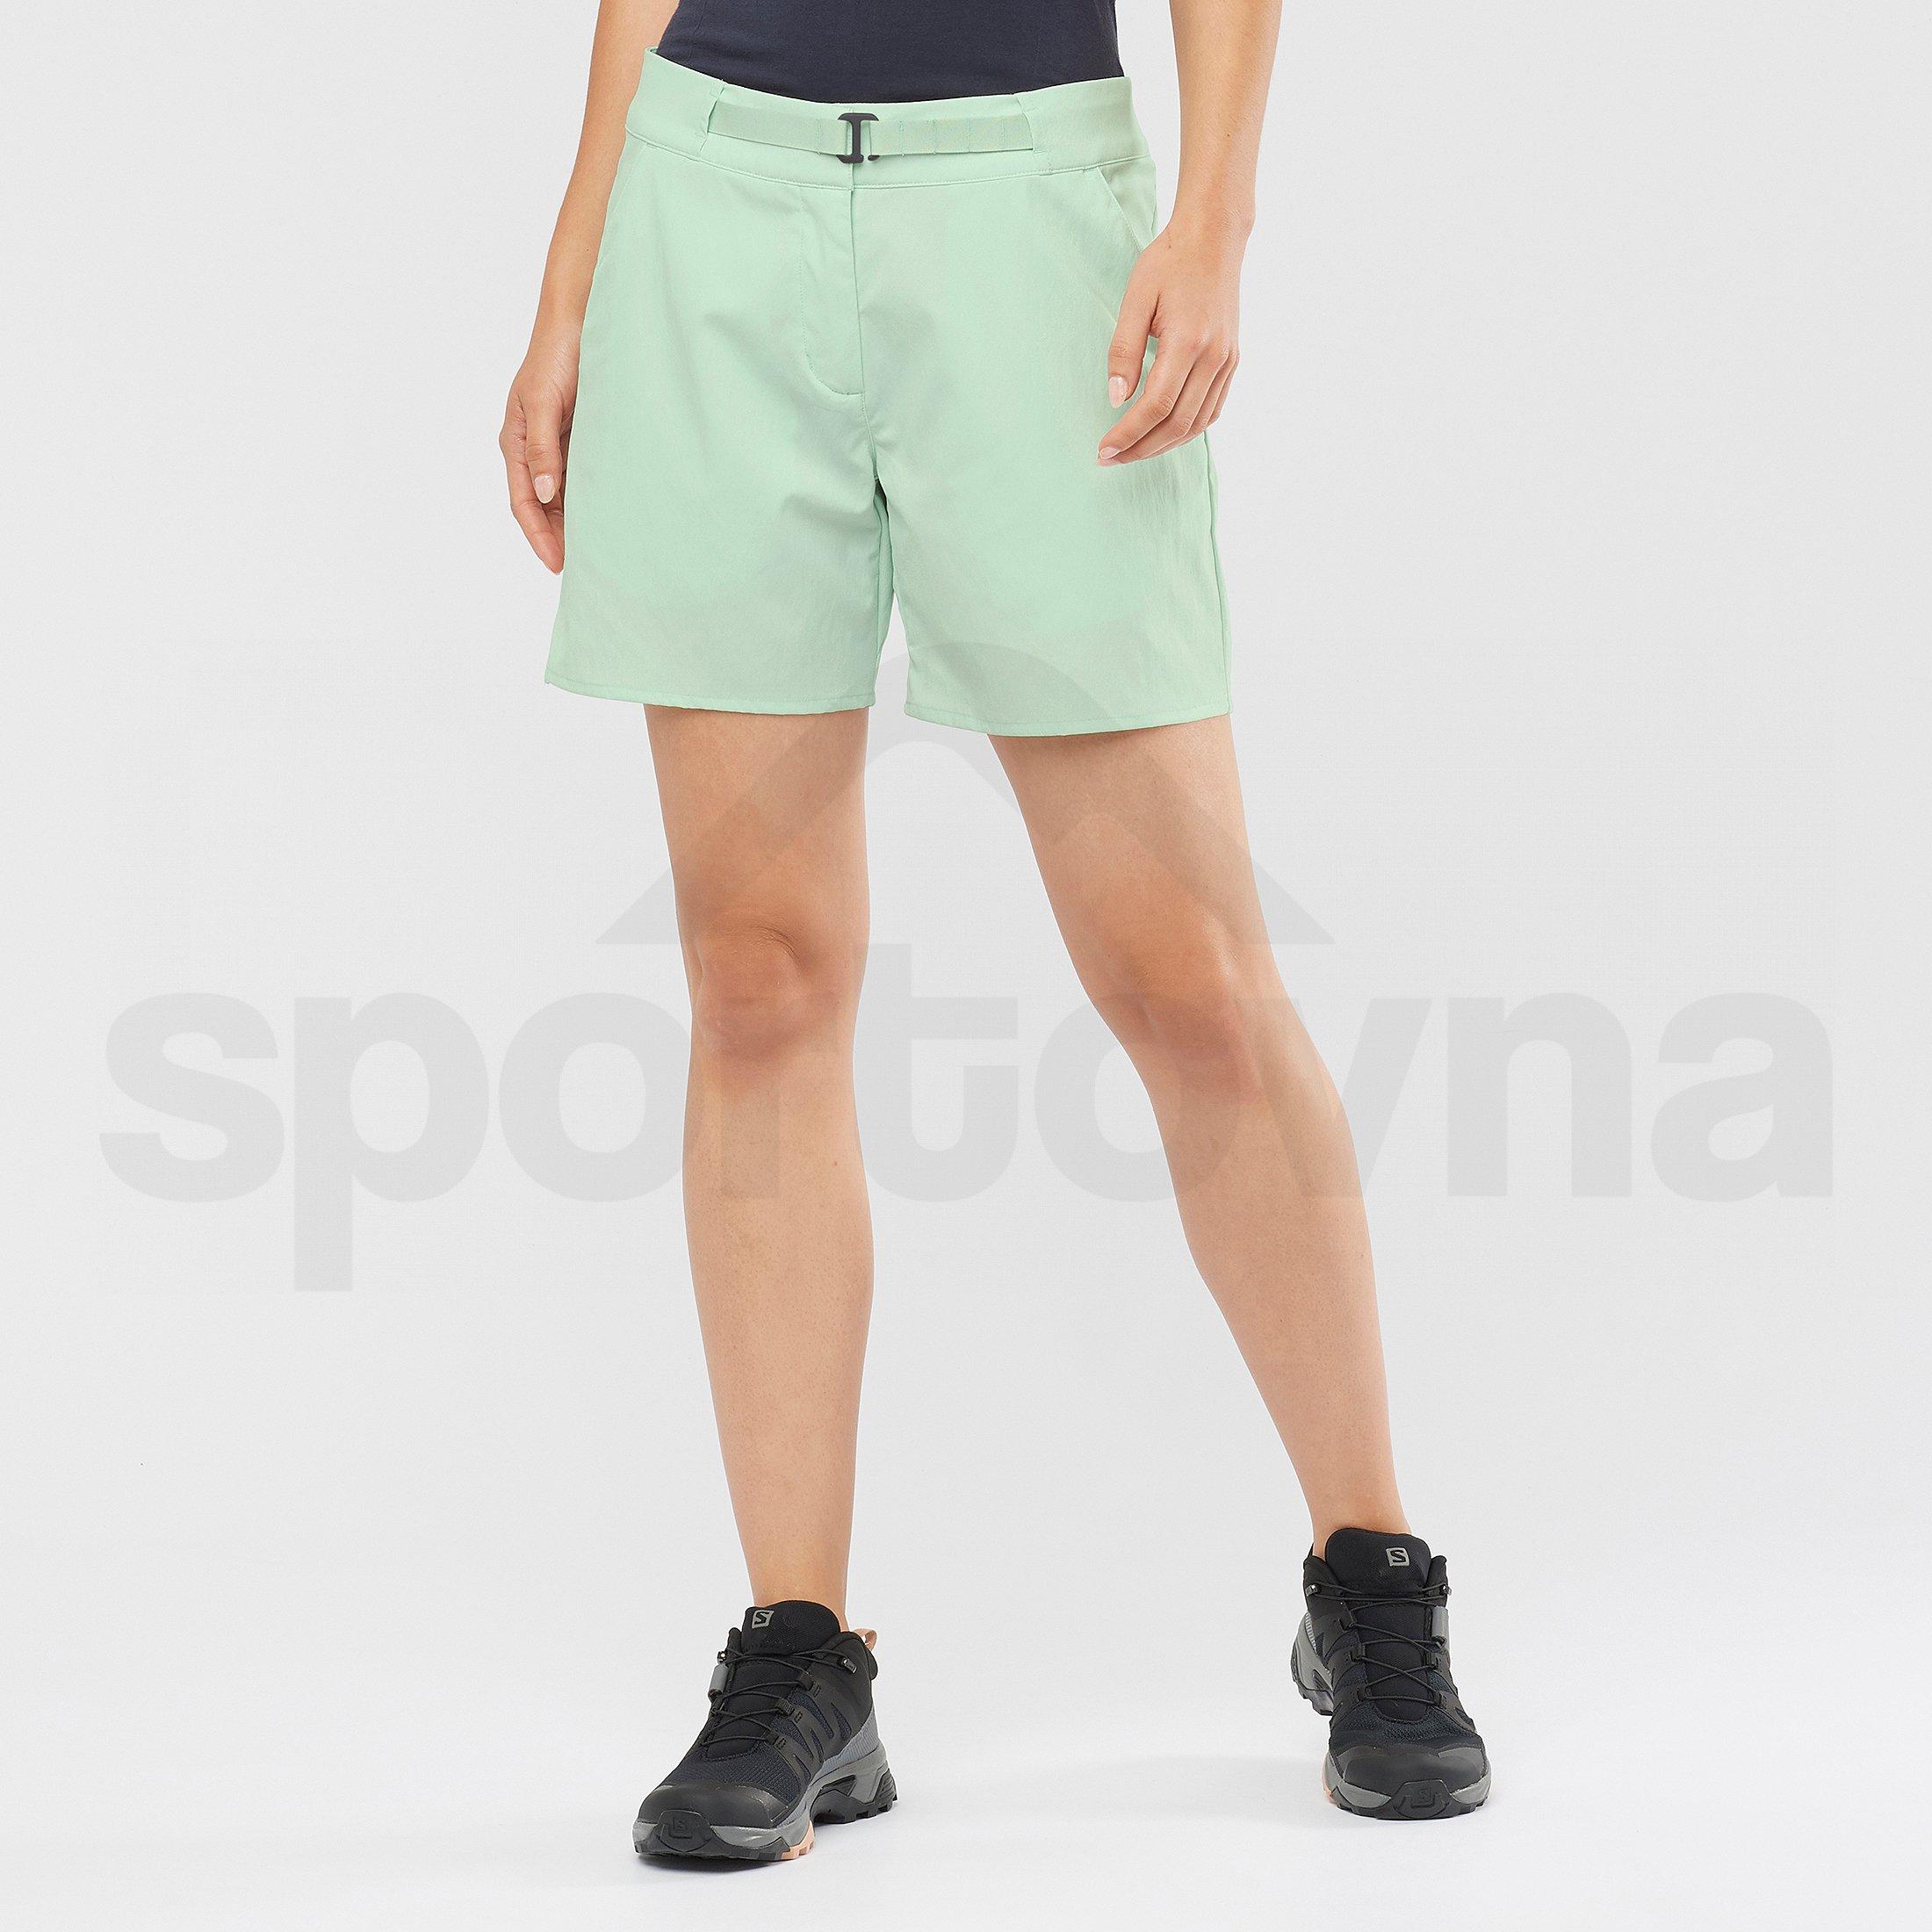 Kraťasy Salomon Outrack Shorts W - zelená